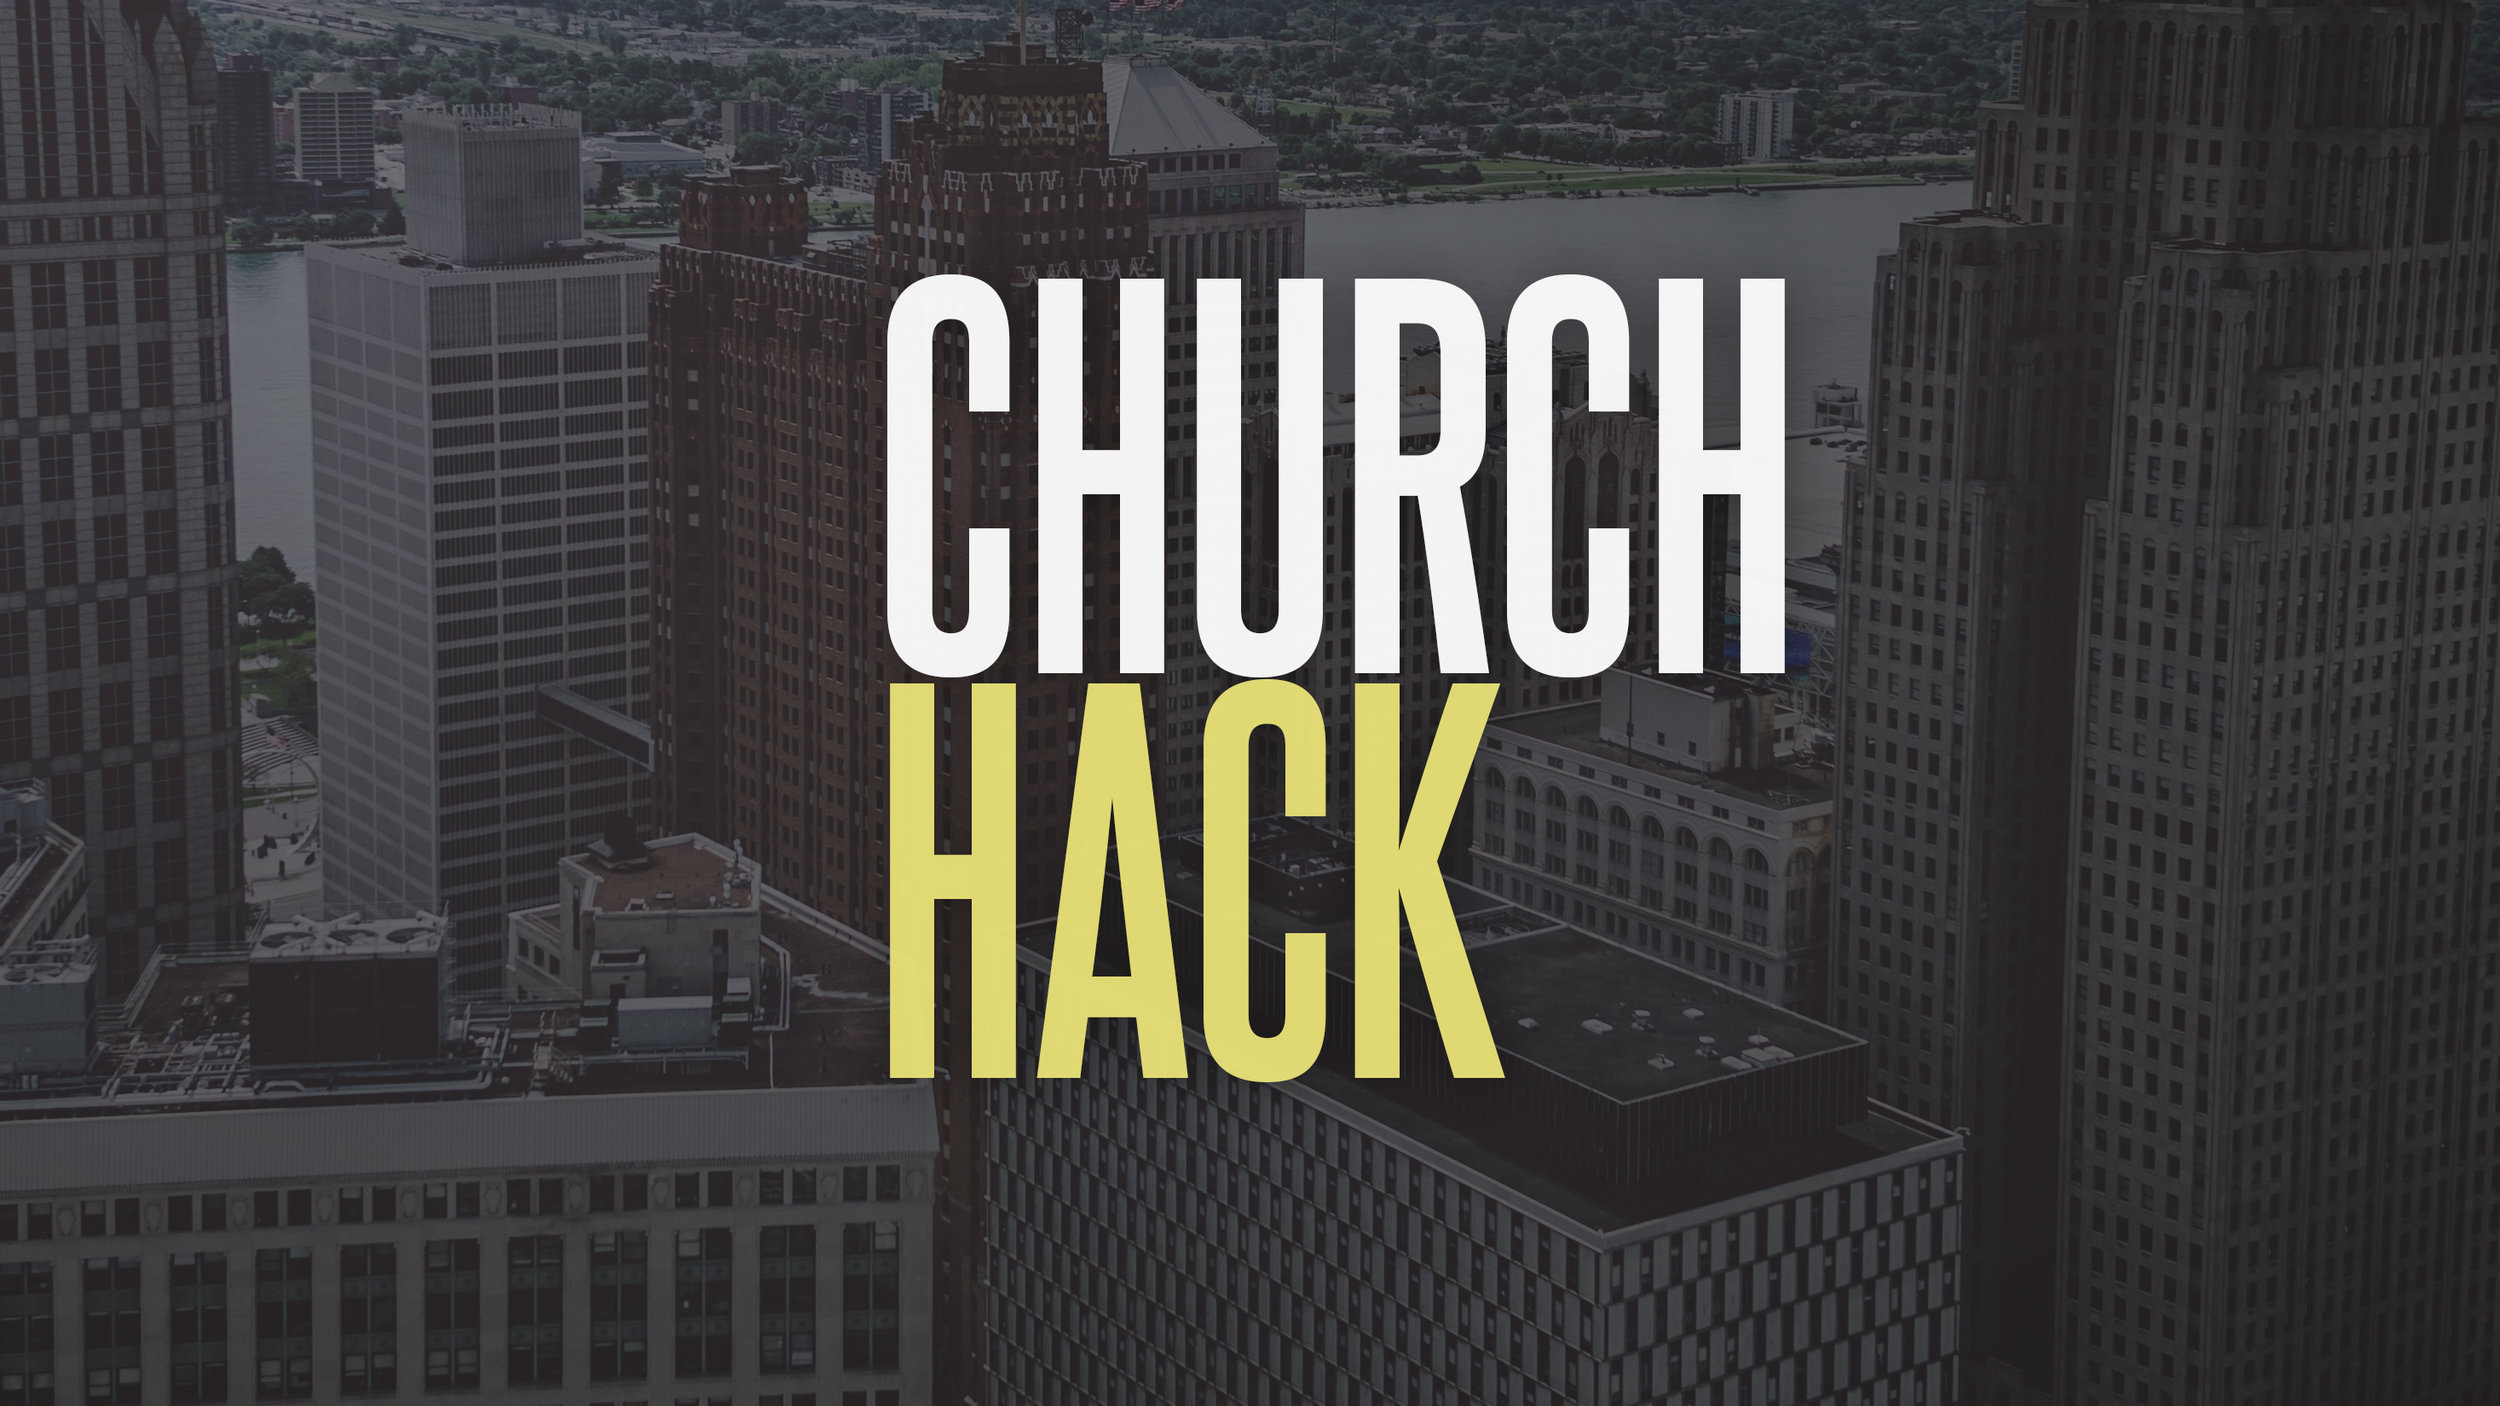 ChurchHack_Title.jpg